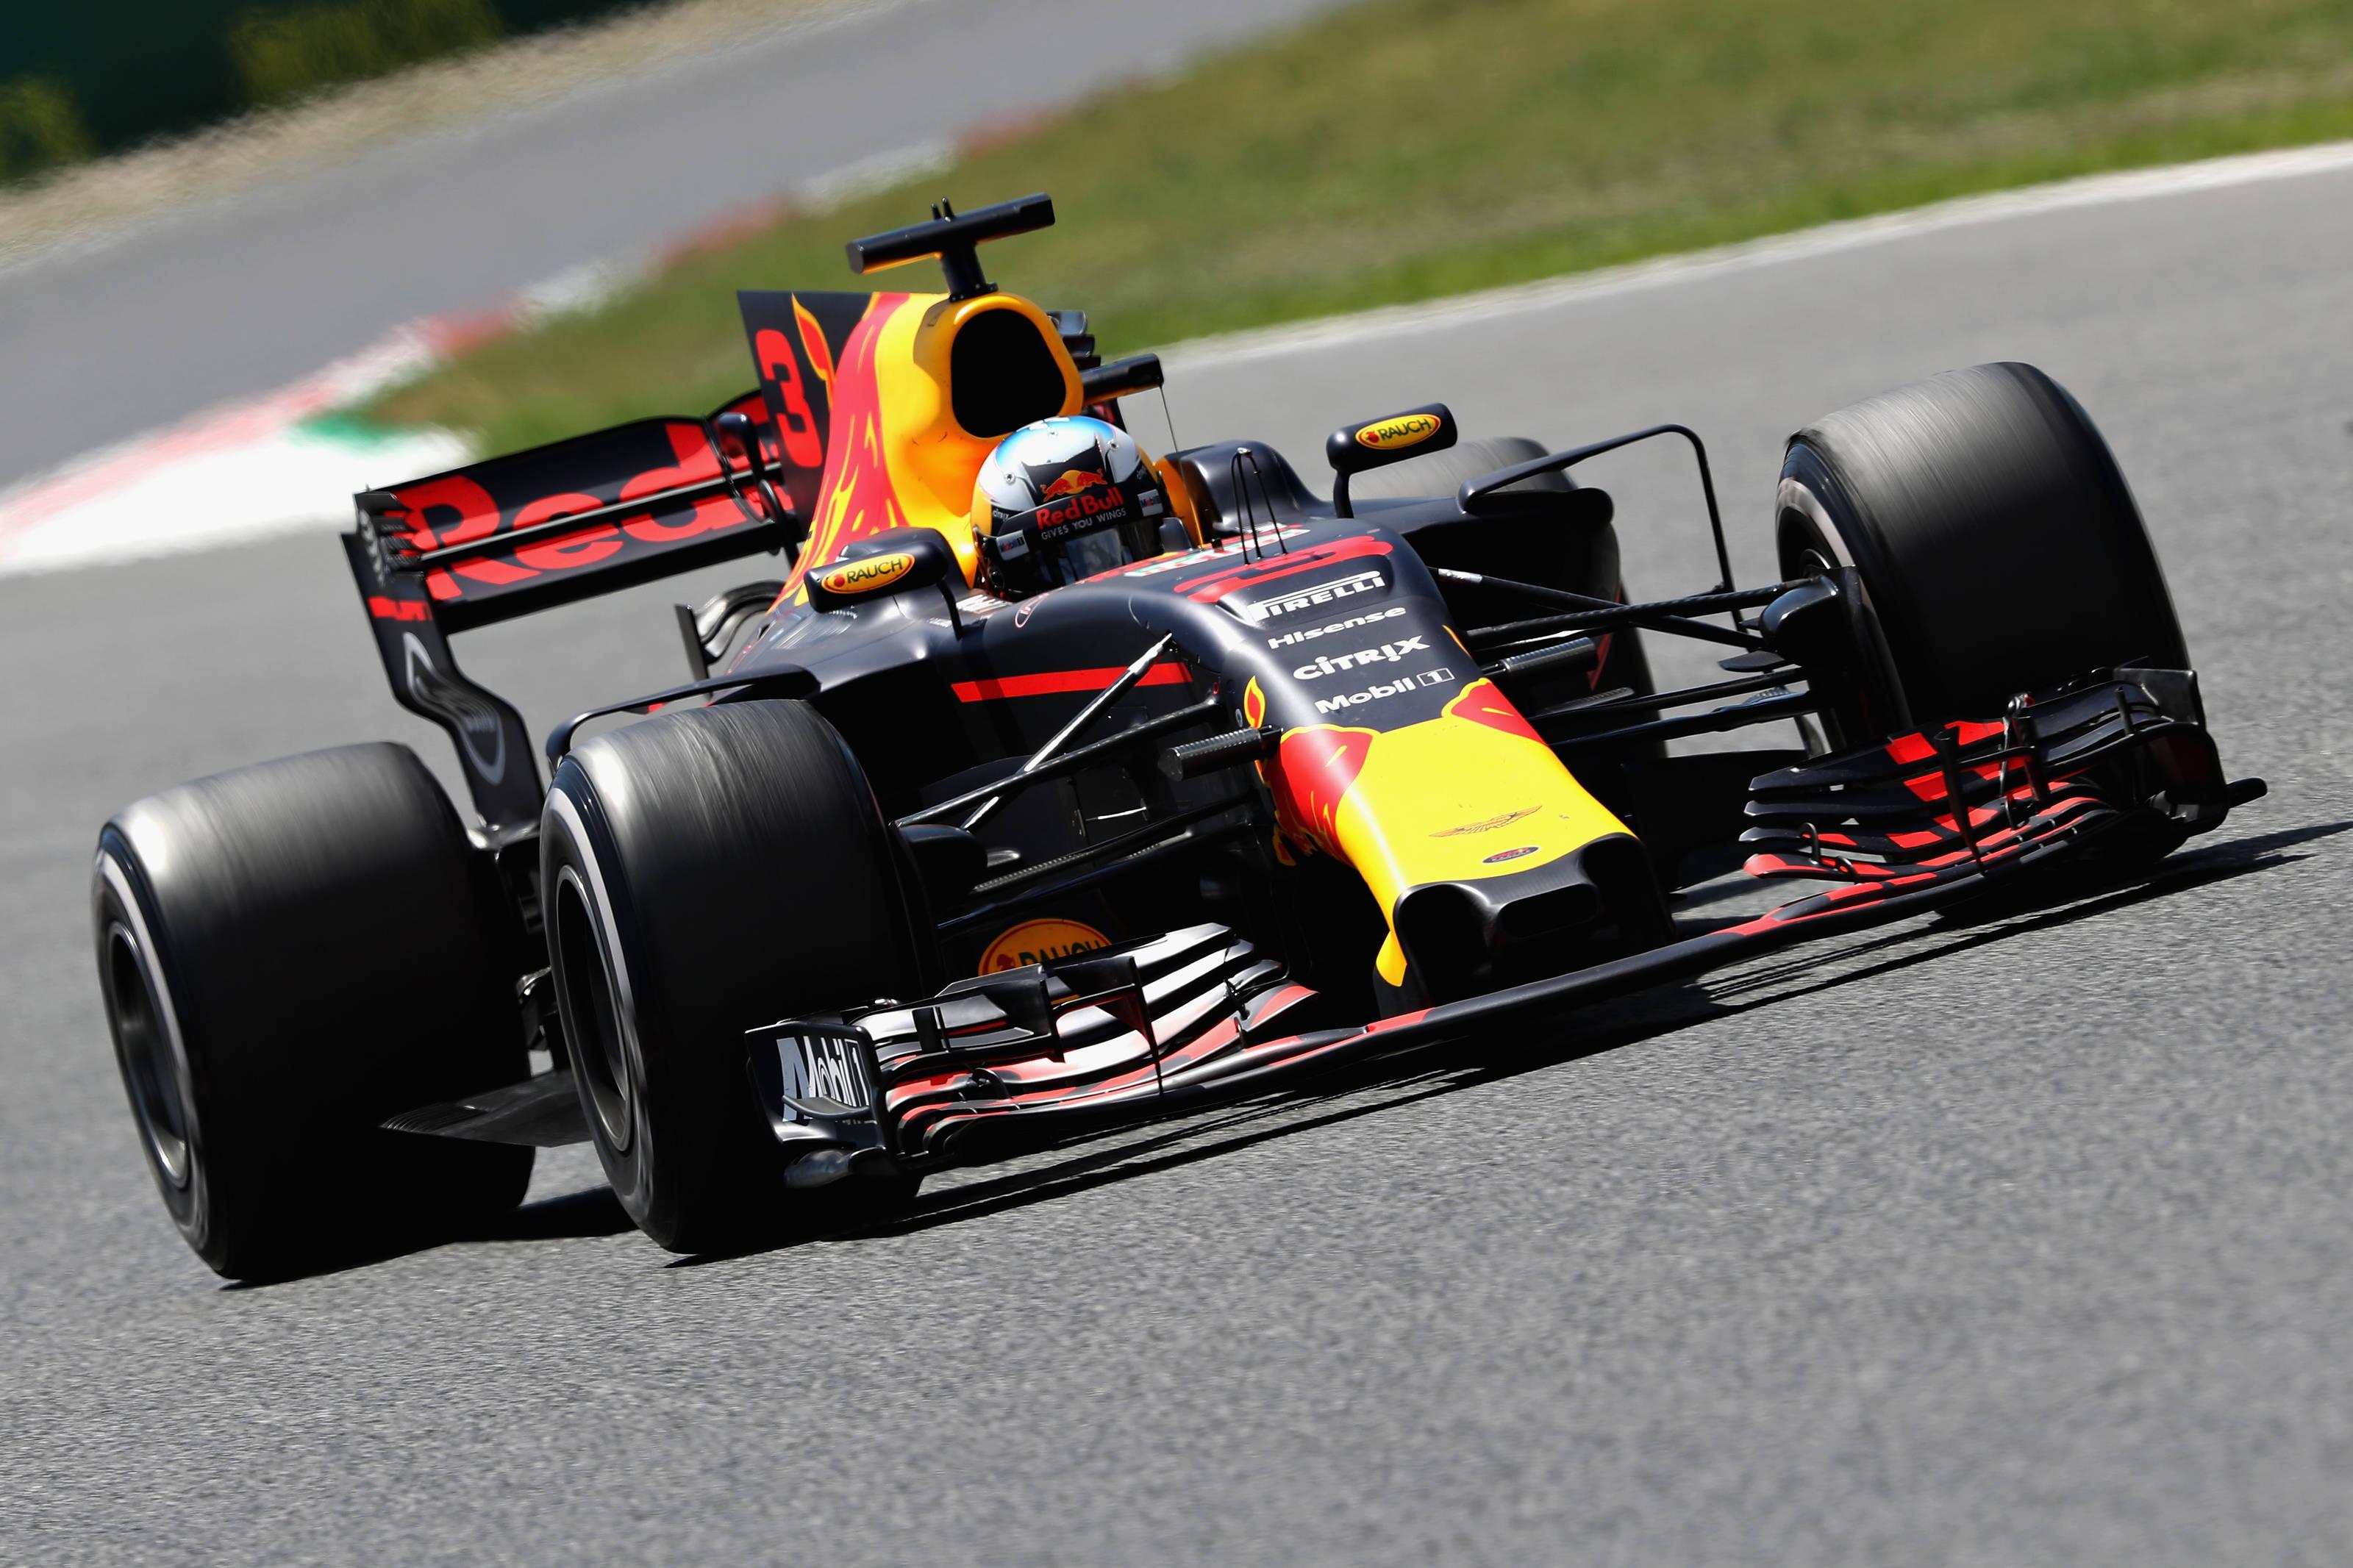 Daniel Ricciardo finished third at Catalunya in the Spanish Formula 1 Grand Prix.